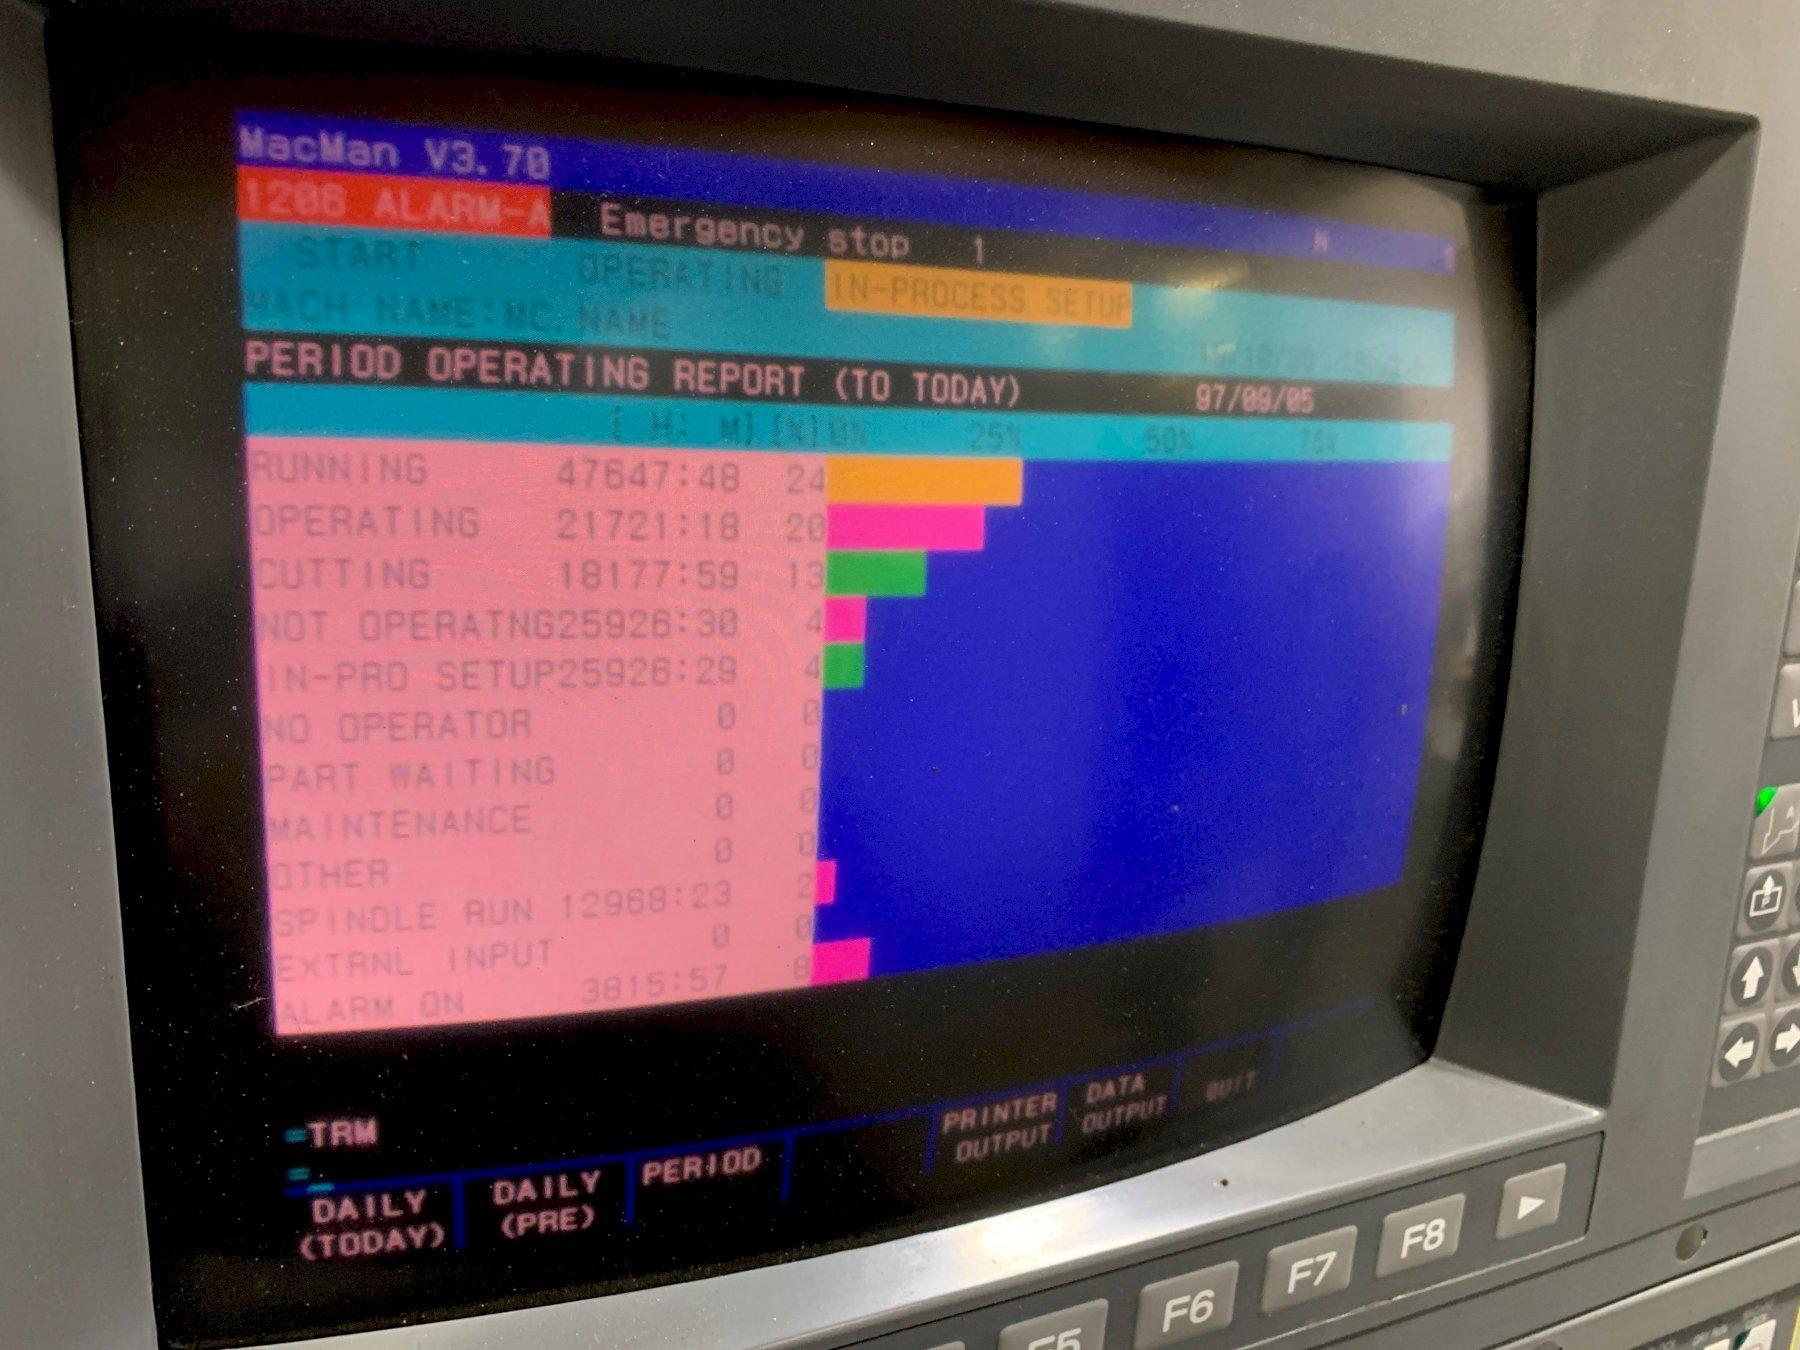 cc250a9a197af9e77f0a9c02cdb197b3-2bfe8b8ab5d46e01c11f9c432c519561.jpeg